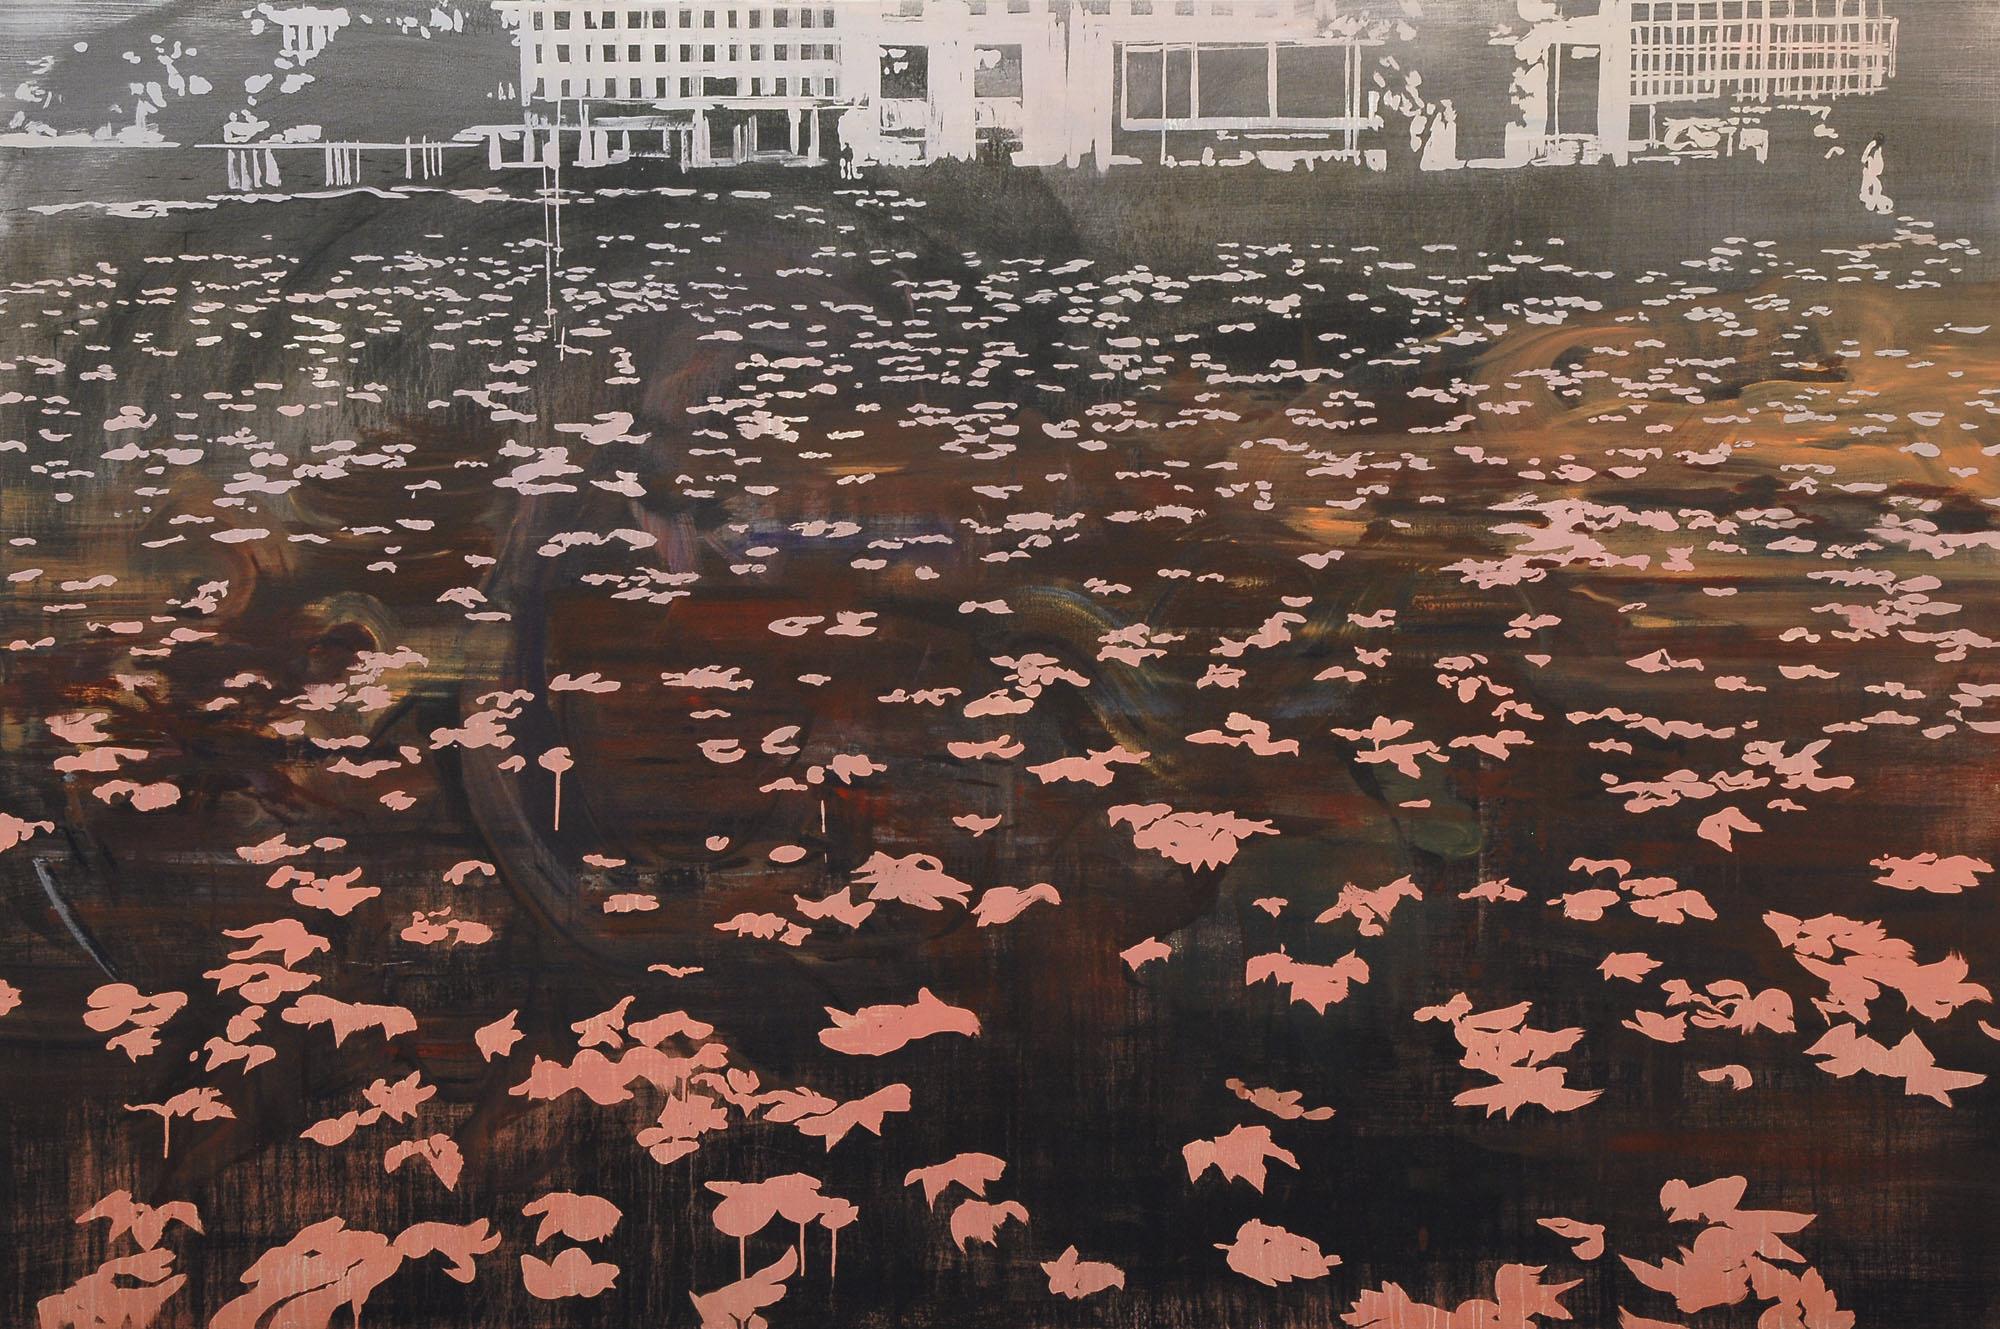 Lu Song 吕松, Falling Leaves 落叶, 2014, Oil on canvas 布面油画, 200 x 300 cm